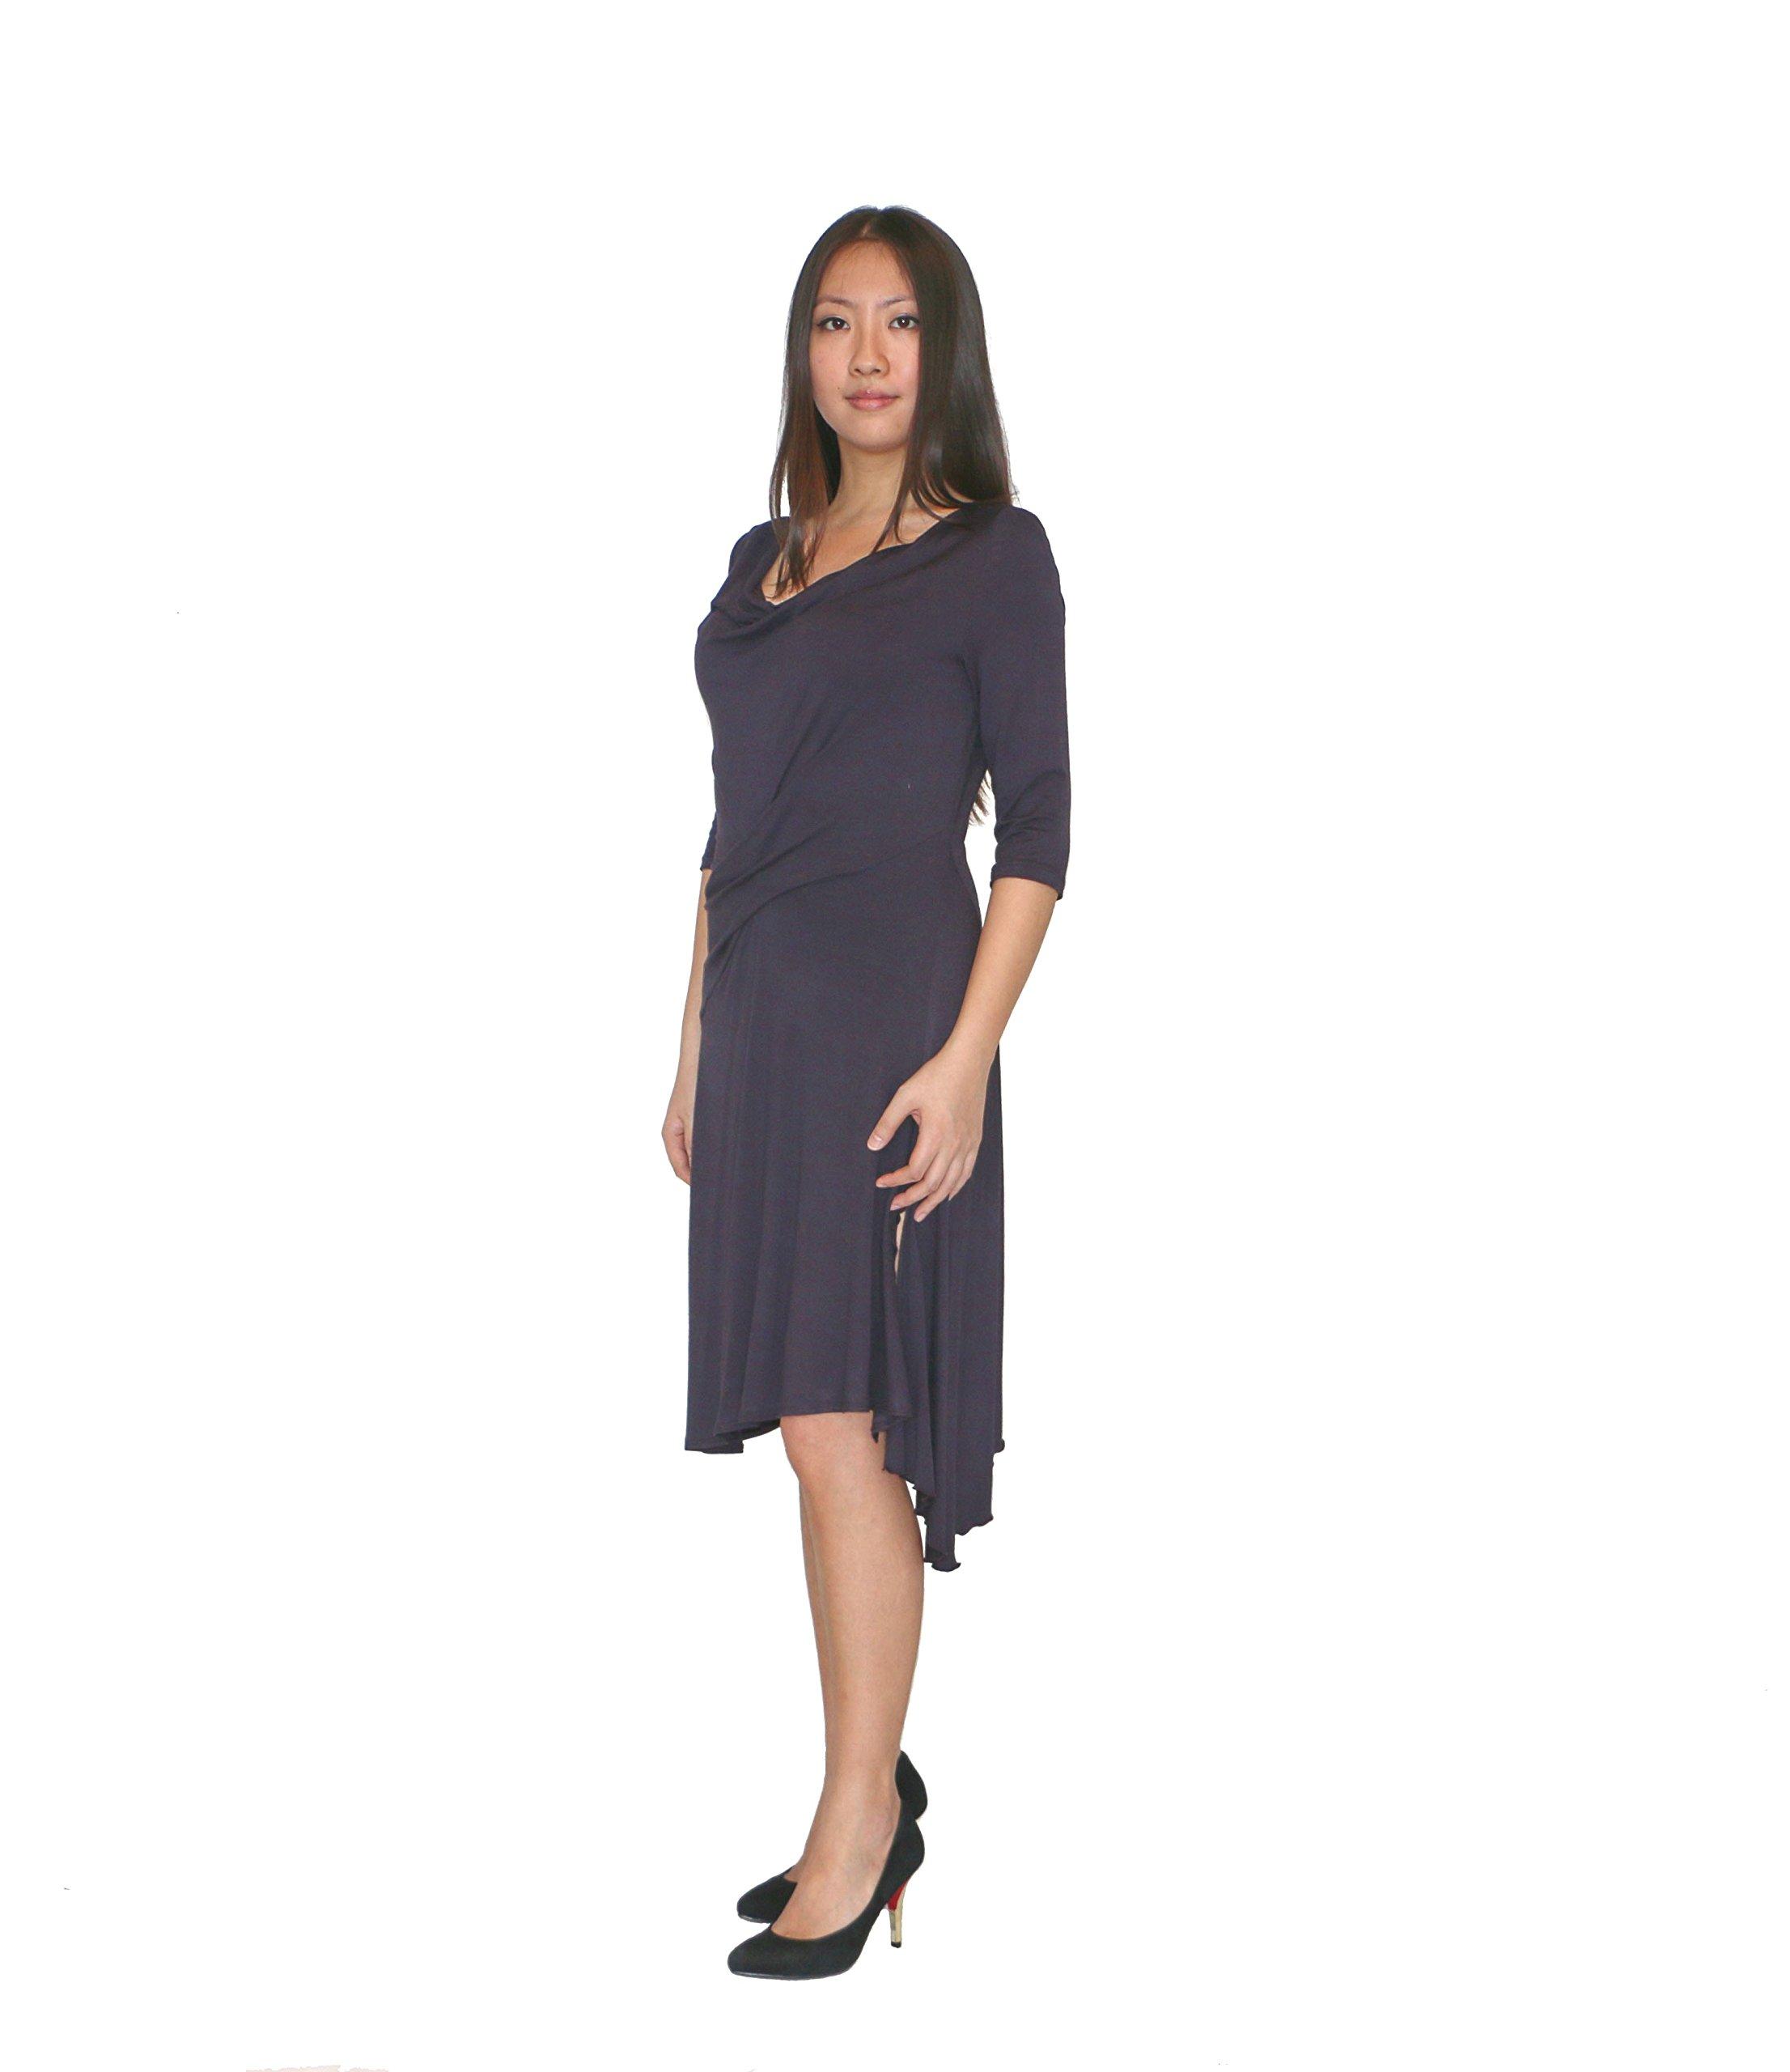 H.Y. Style Womens Asymmetric Cowl Neck 3/4 Sleeve Dress Medium Dark Purple by HY STYLE